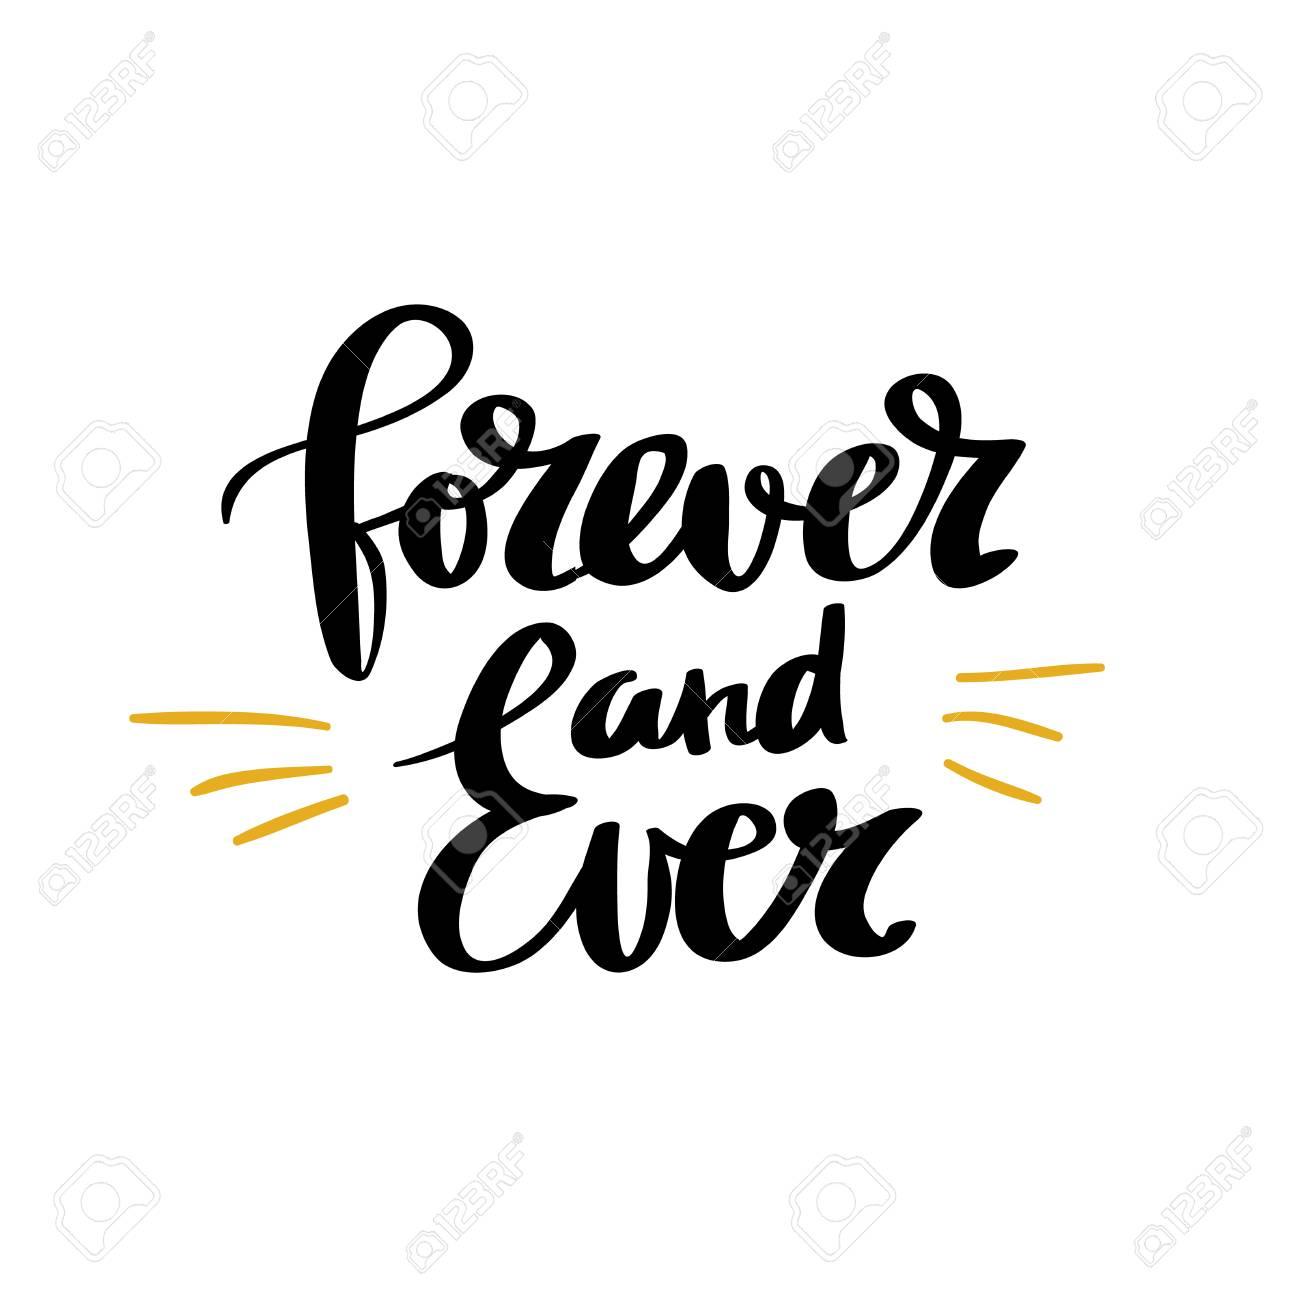 Letras De Texto Vectorial Con Cita Motivacional Tipografía Dulce De Inspiración Linda Elemento De Diseño Gráfico De Cartel Postal De Caligrafía